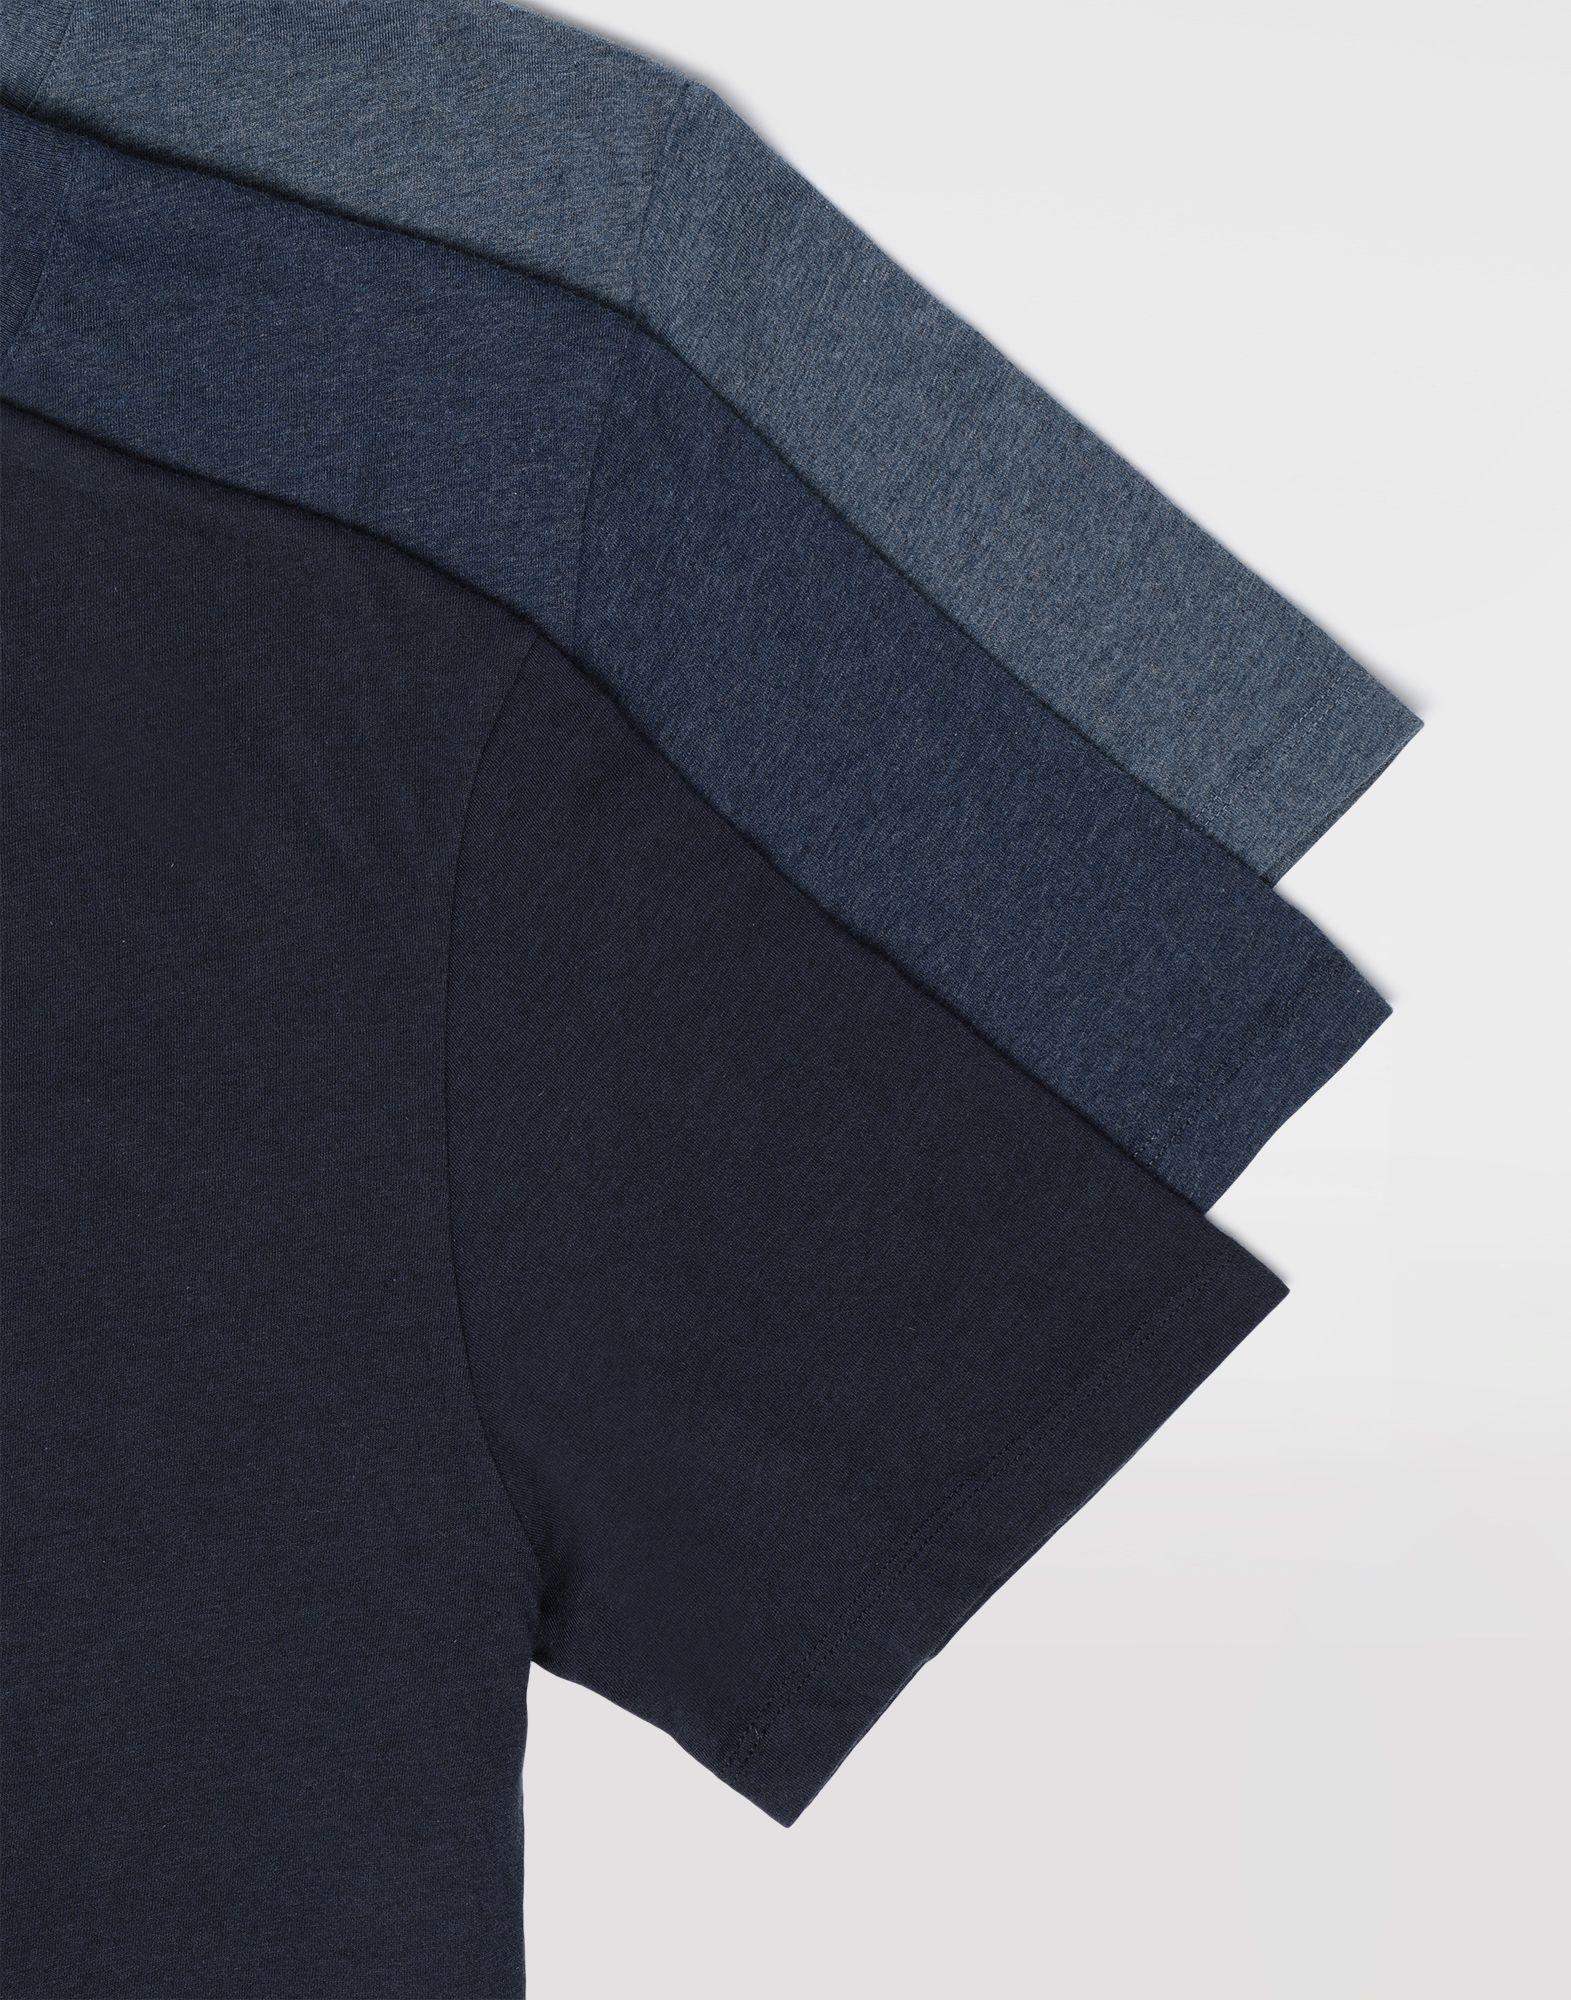 MAISON MARGIELA 3er Pack T-Shirts Stereotype Kurzärmliges T-Shirt Herren e